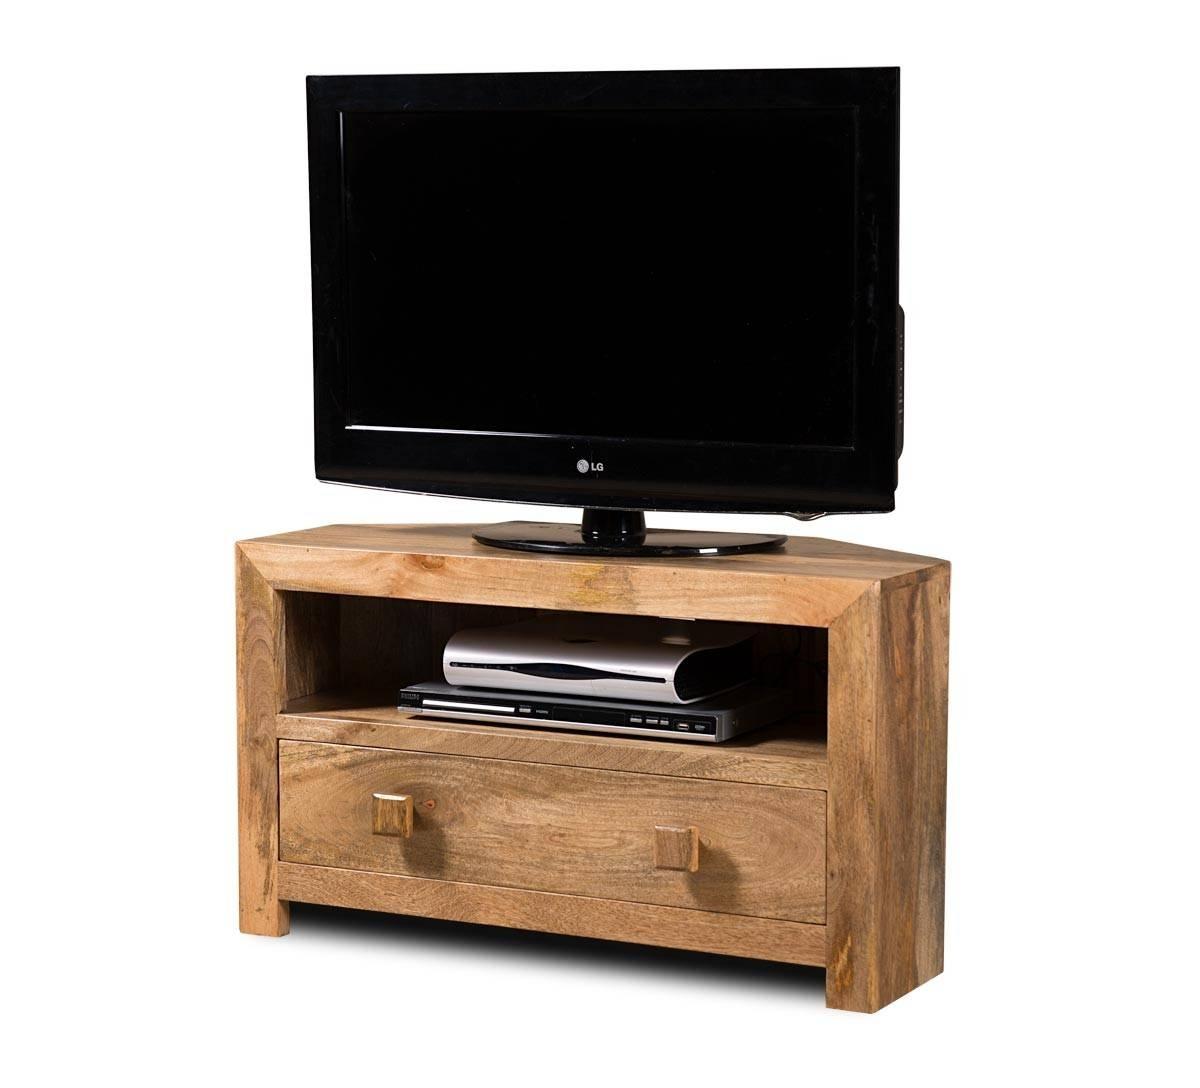 Dakota Light Mango Small Corner Tv Stand | Casa Bella Furniture Uk with regard to Large Corner Tv Stands (Image 3 of 15)